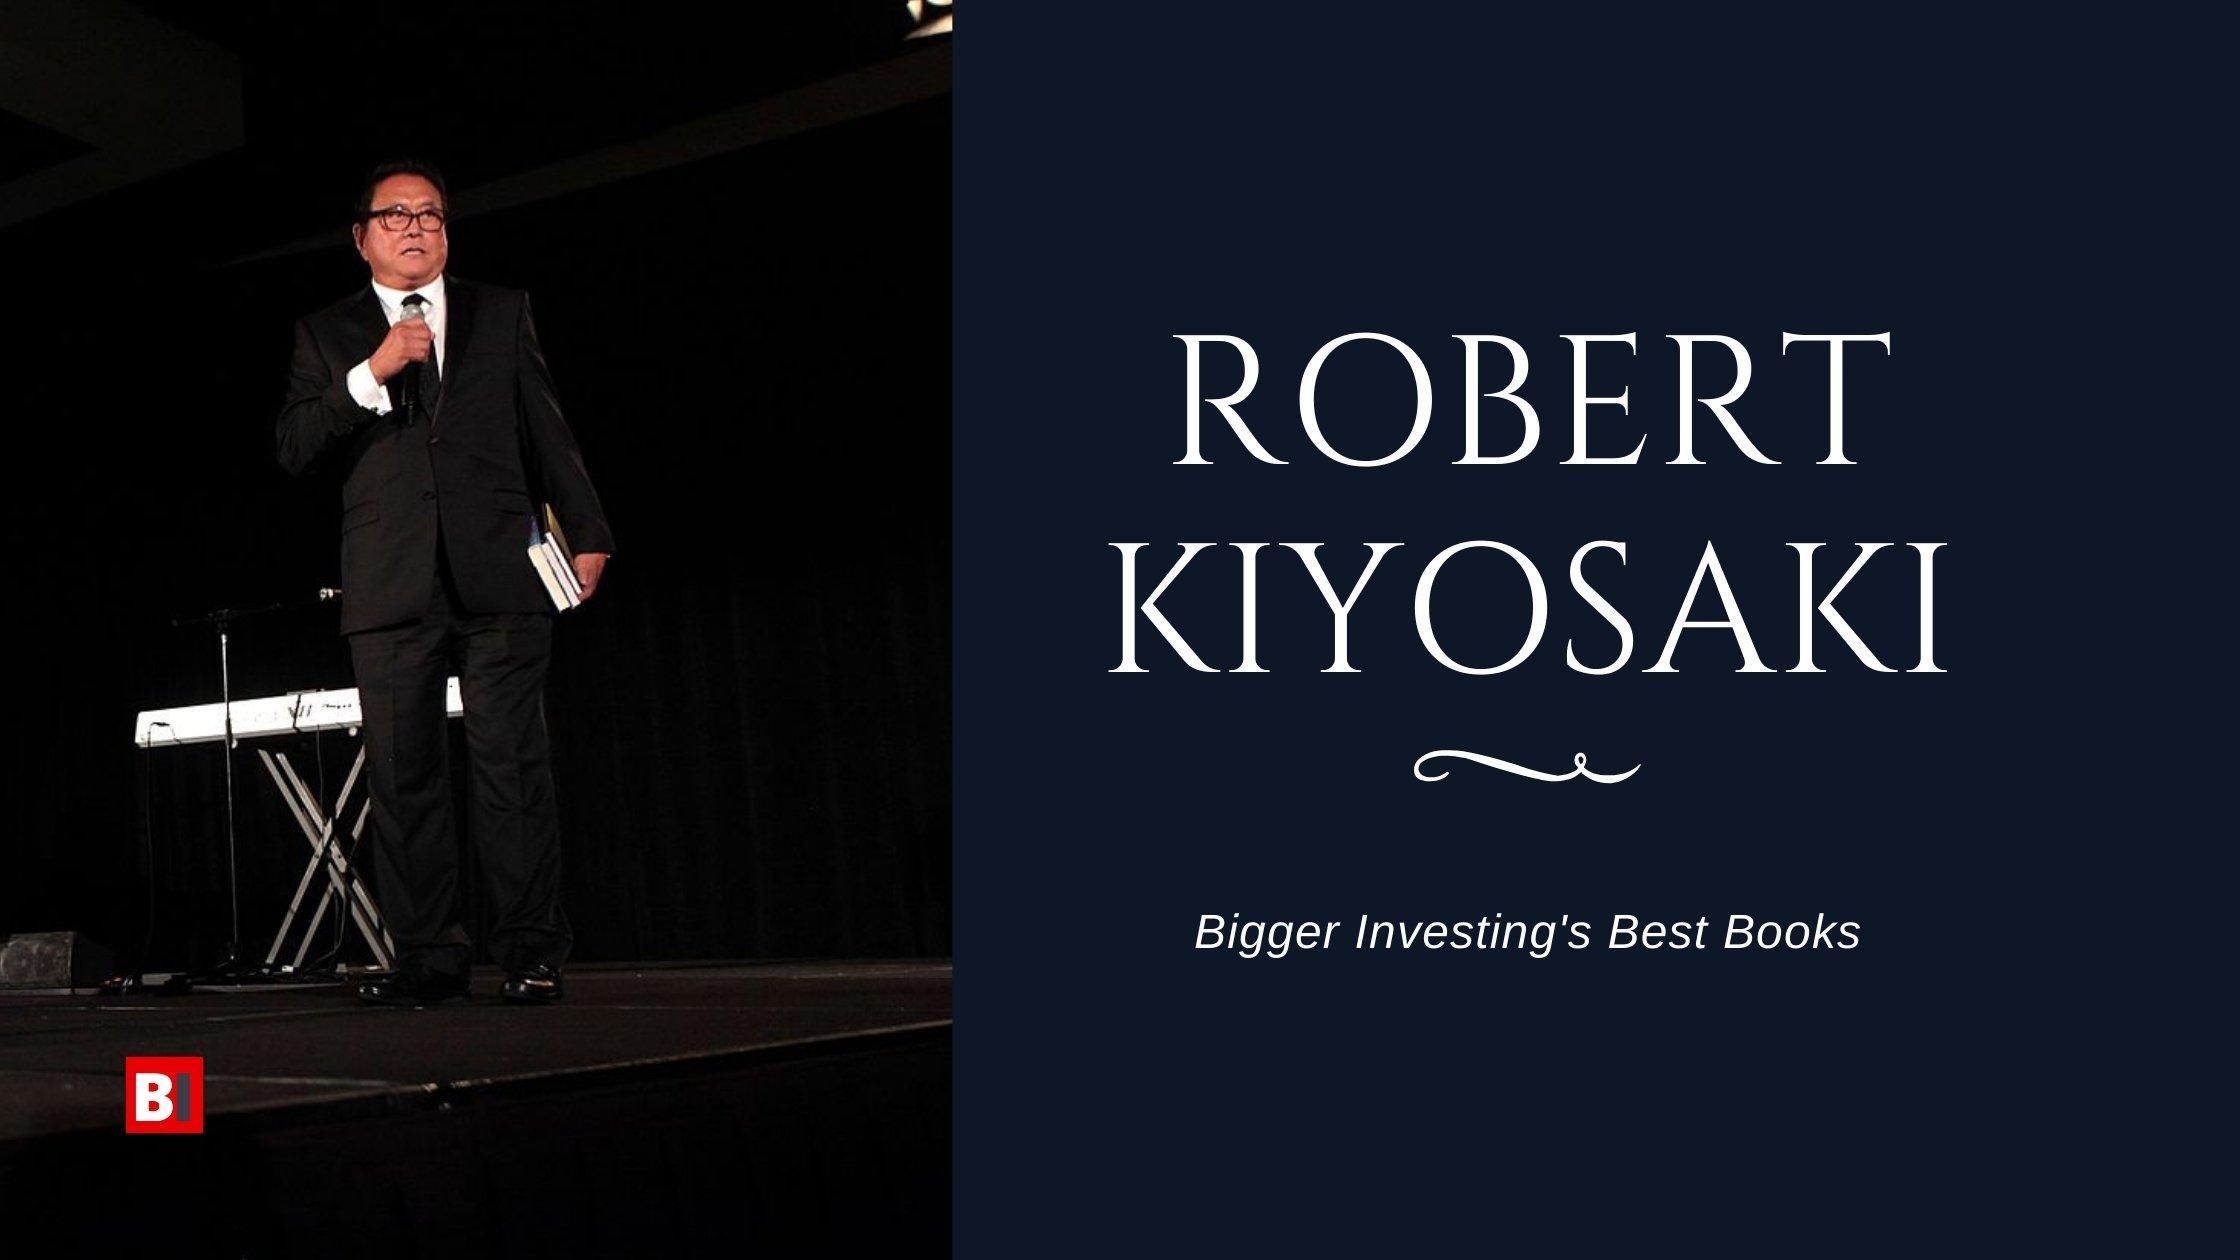 Best Books Written by Robert Kiyosaki